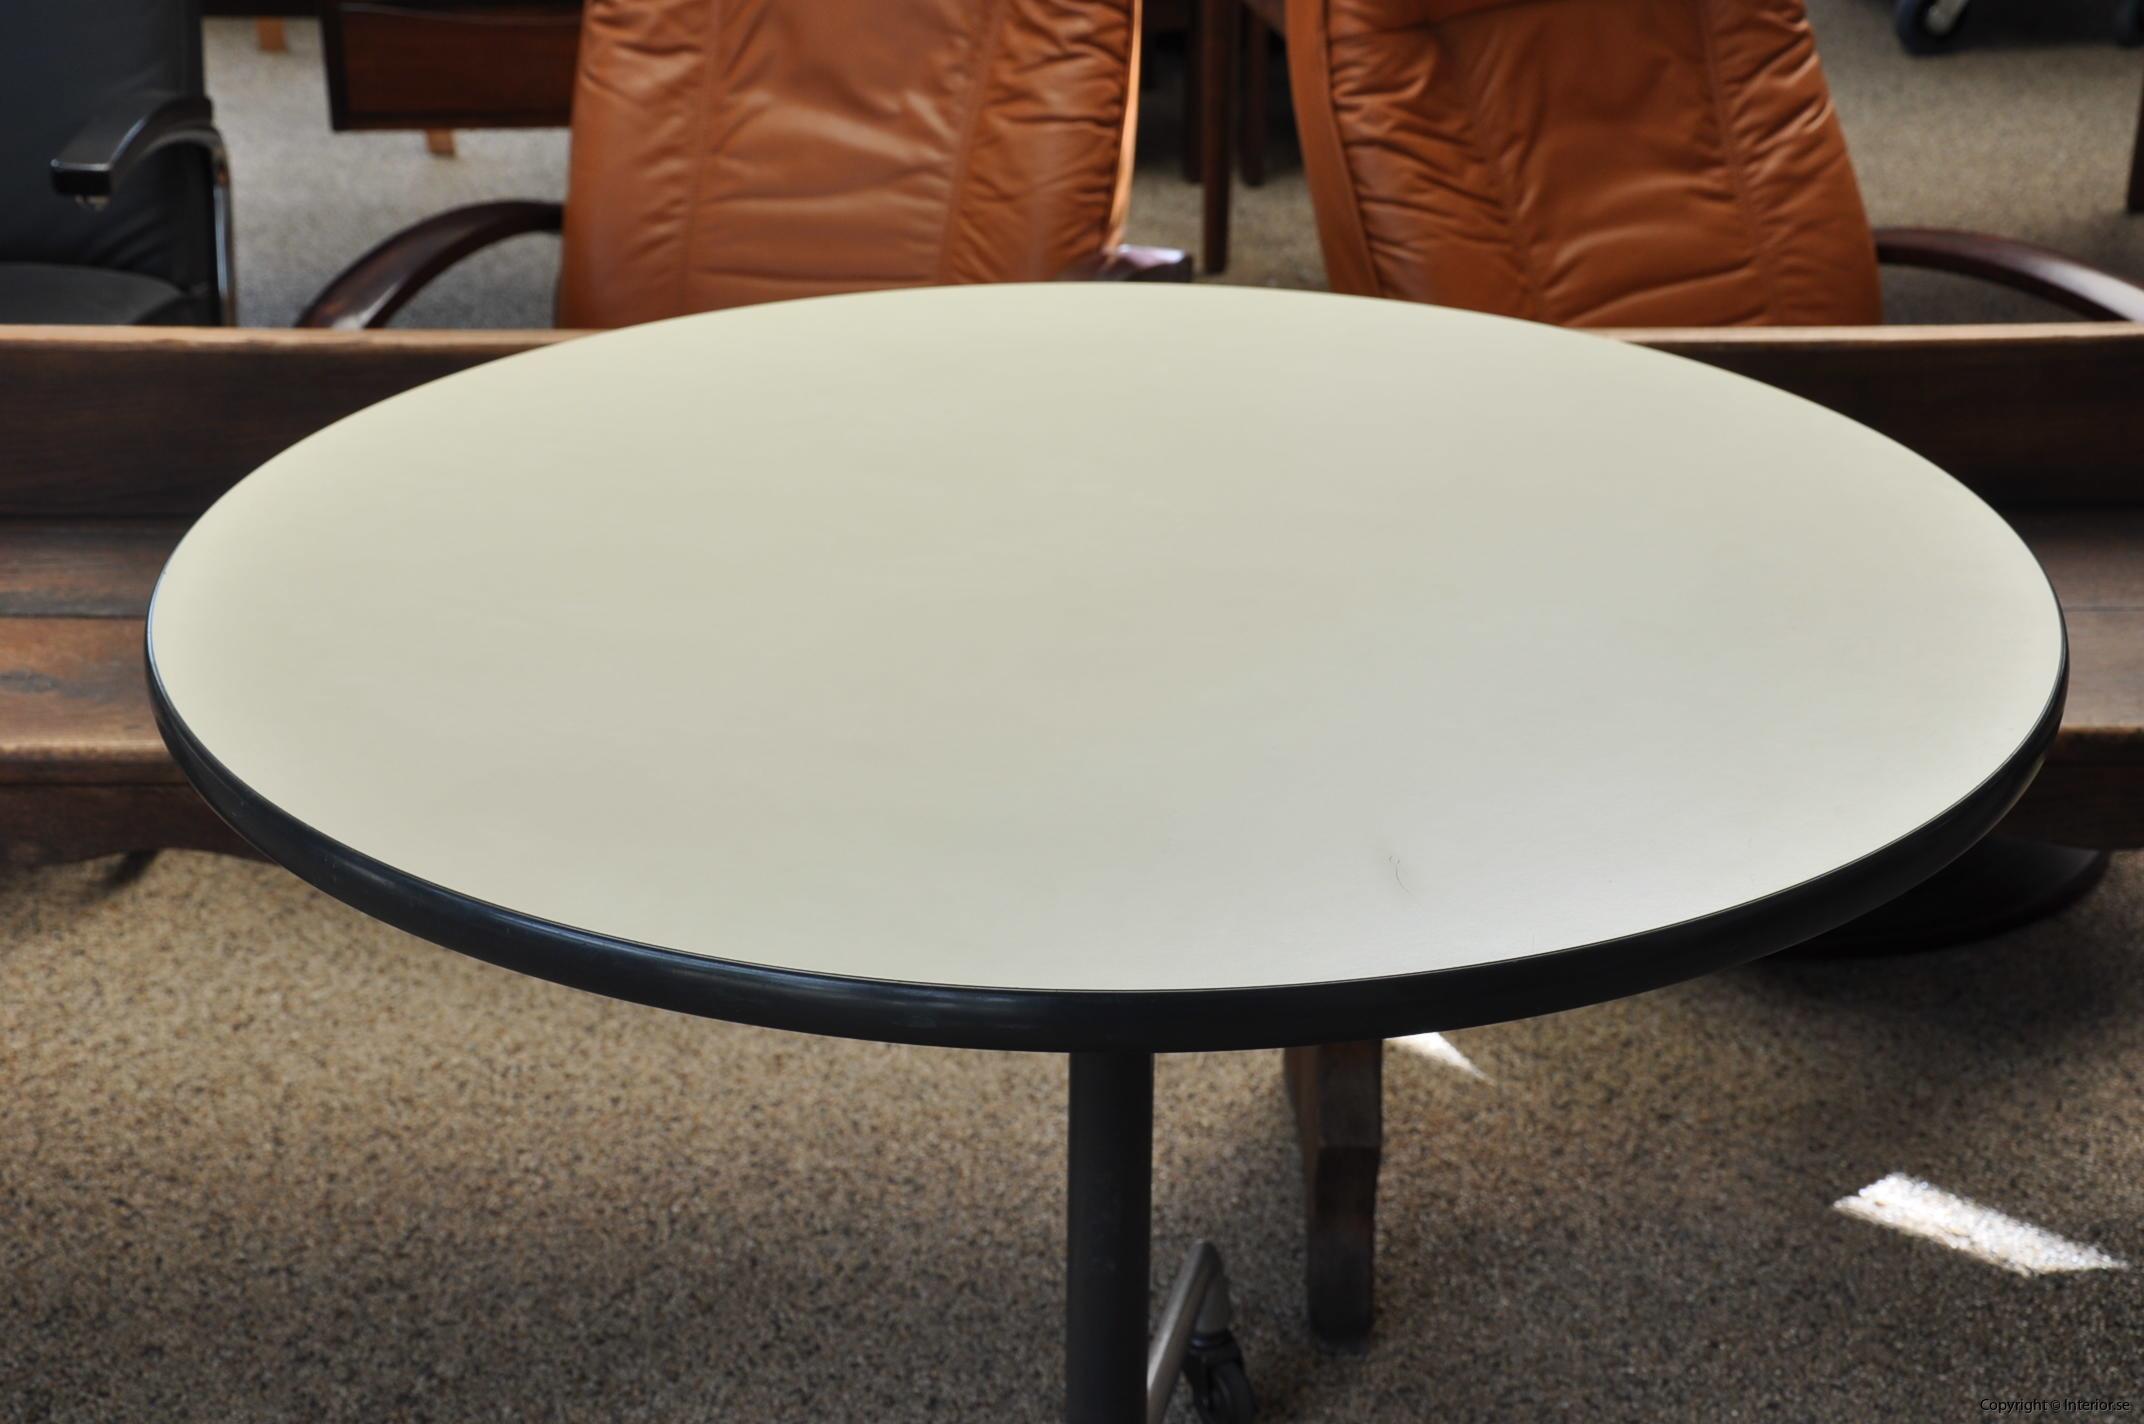 Herman Miller Rullbord Designmöbler begagnade kontorsmöbler (3)